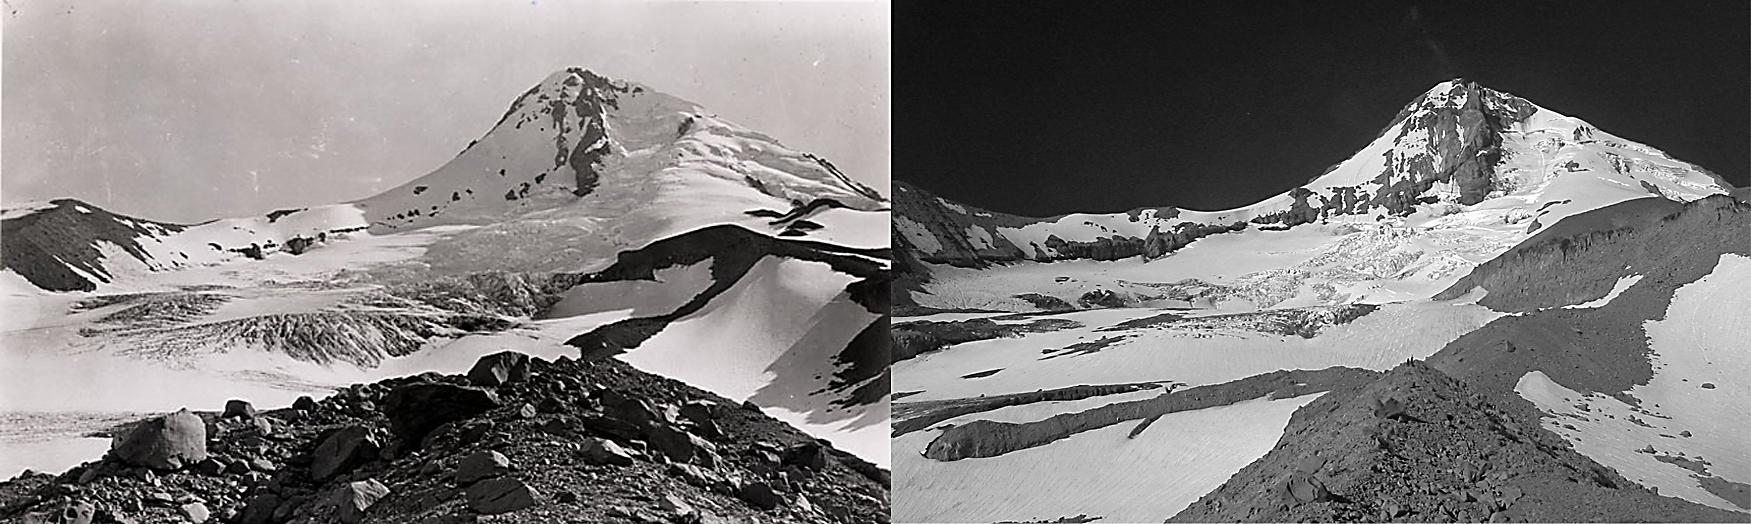 Eliot Glacier 1901/2006